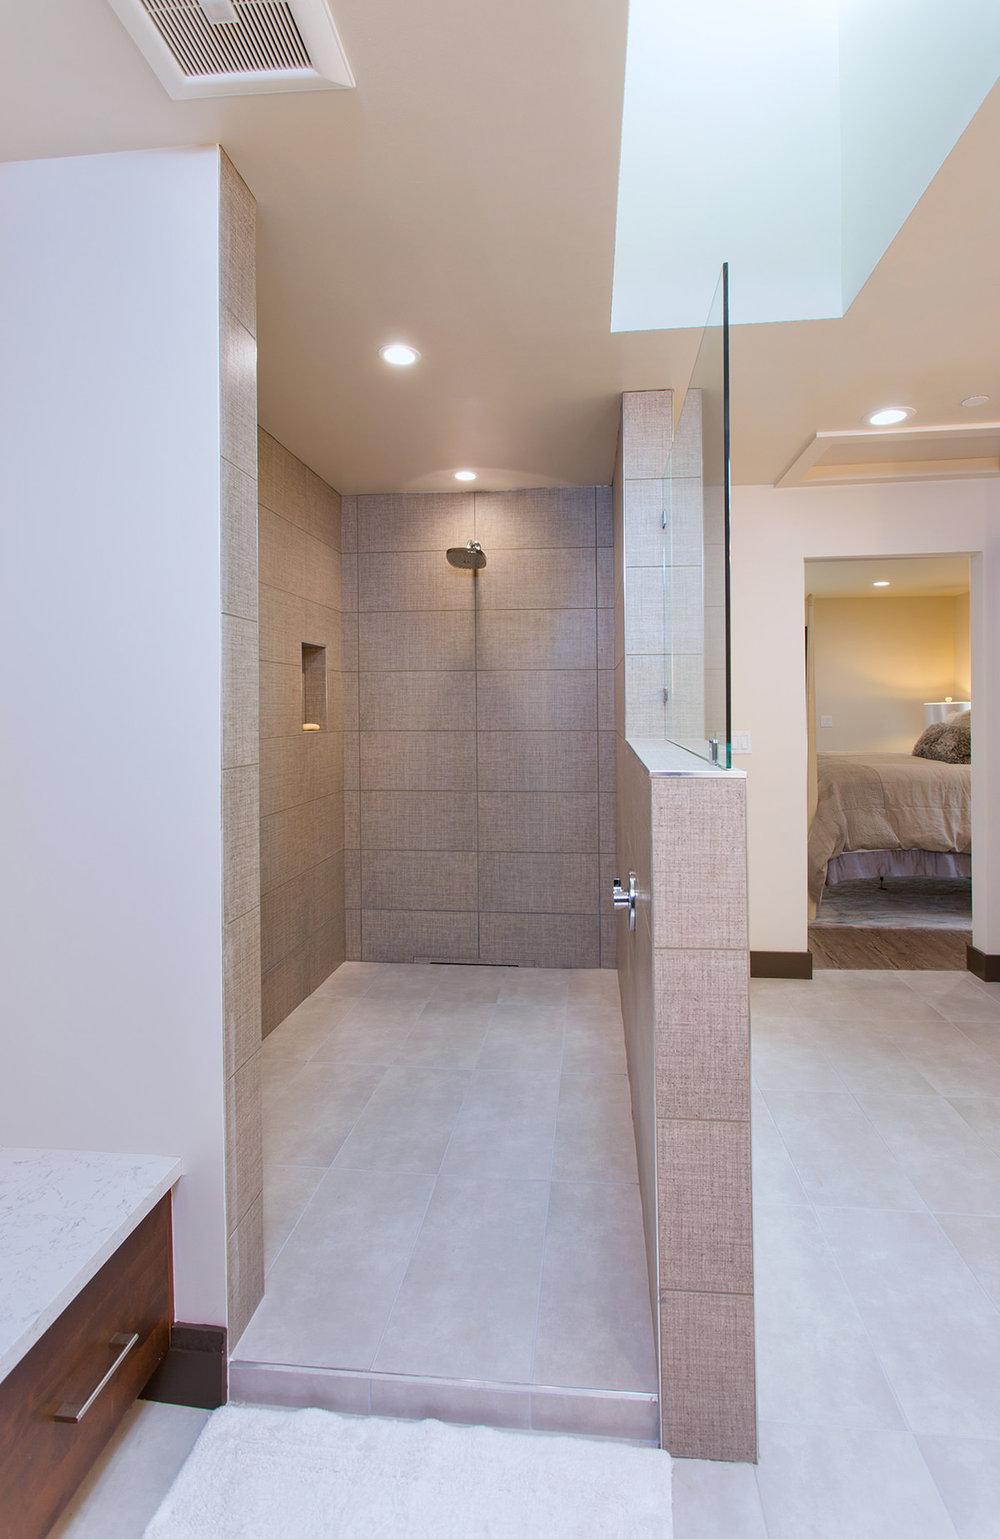 custom-walkin-shower-interior-design-los-altos-california-ktj-design-co-1.jpg